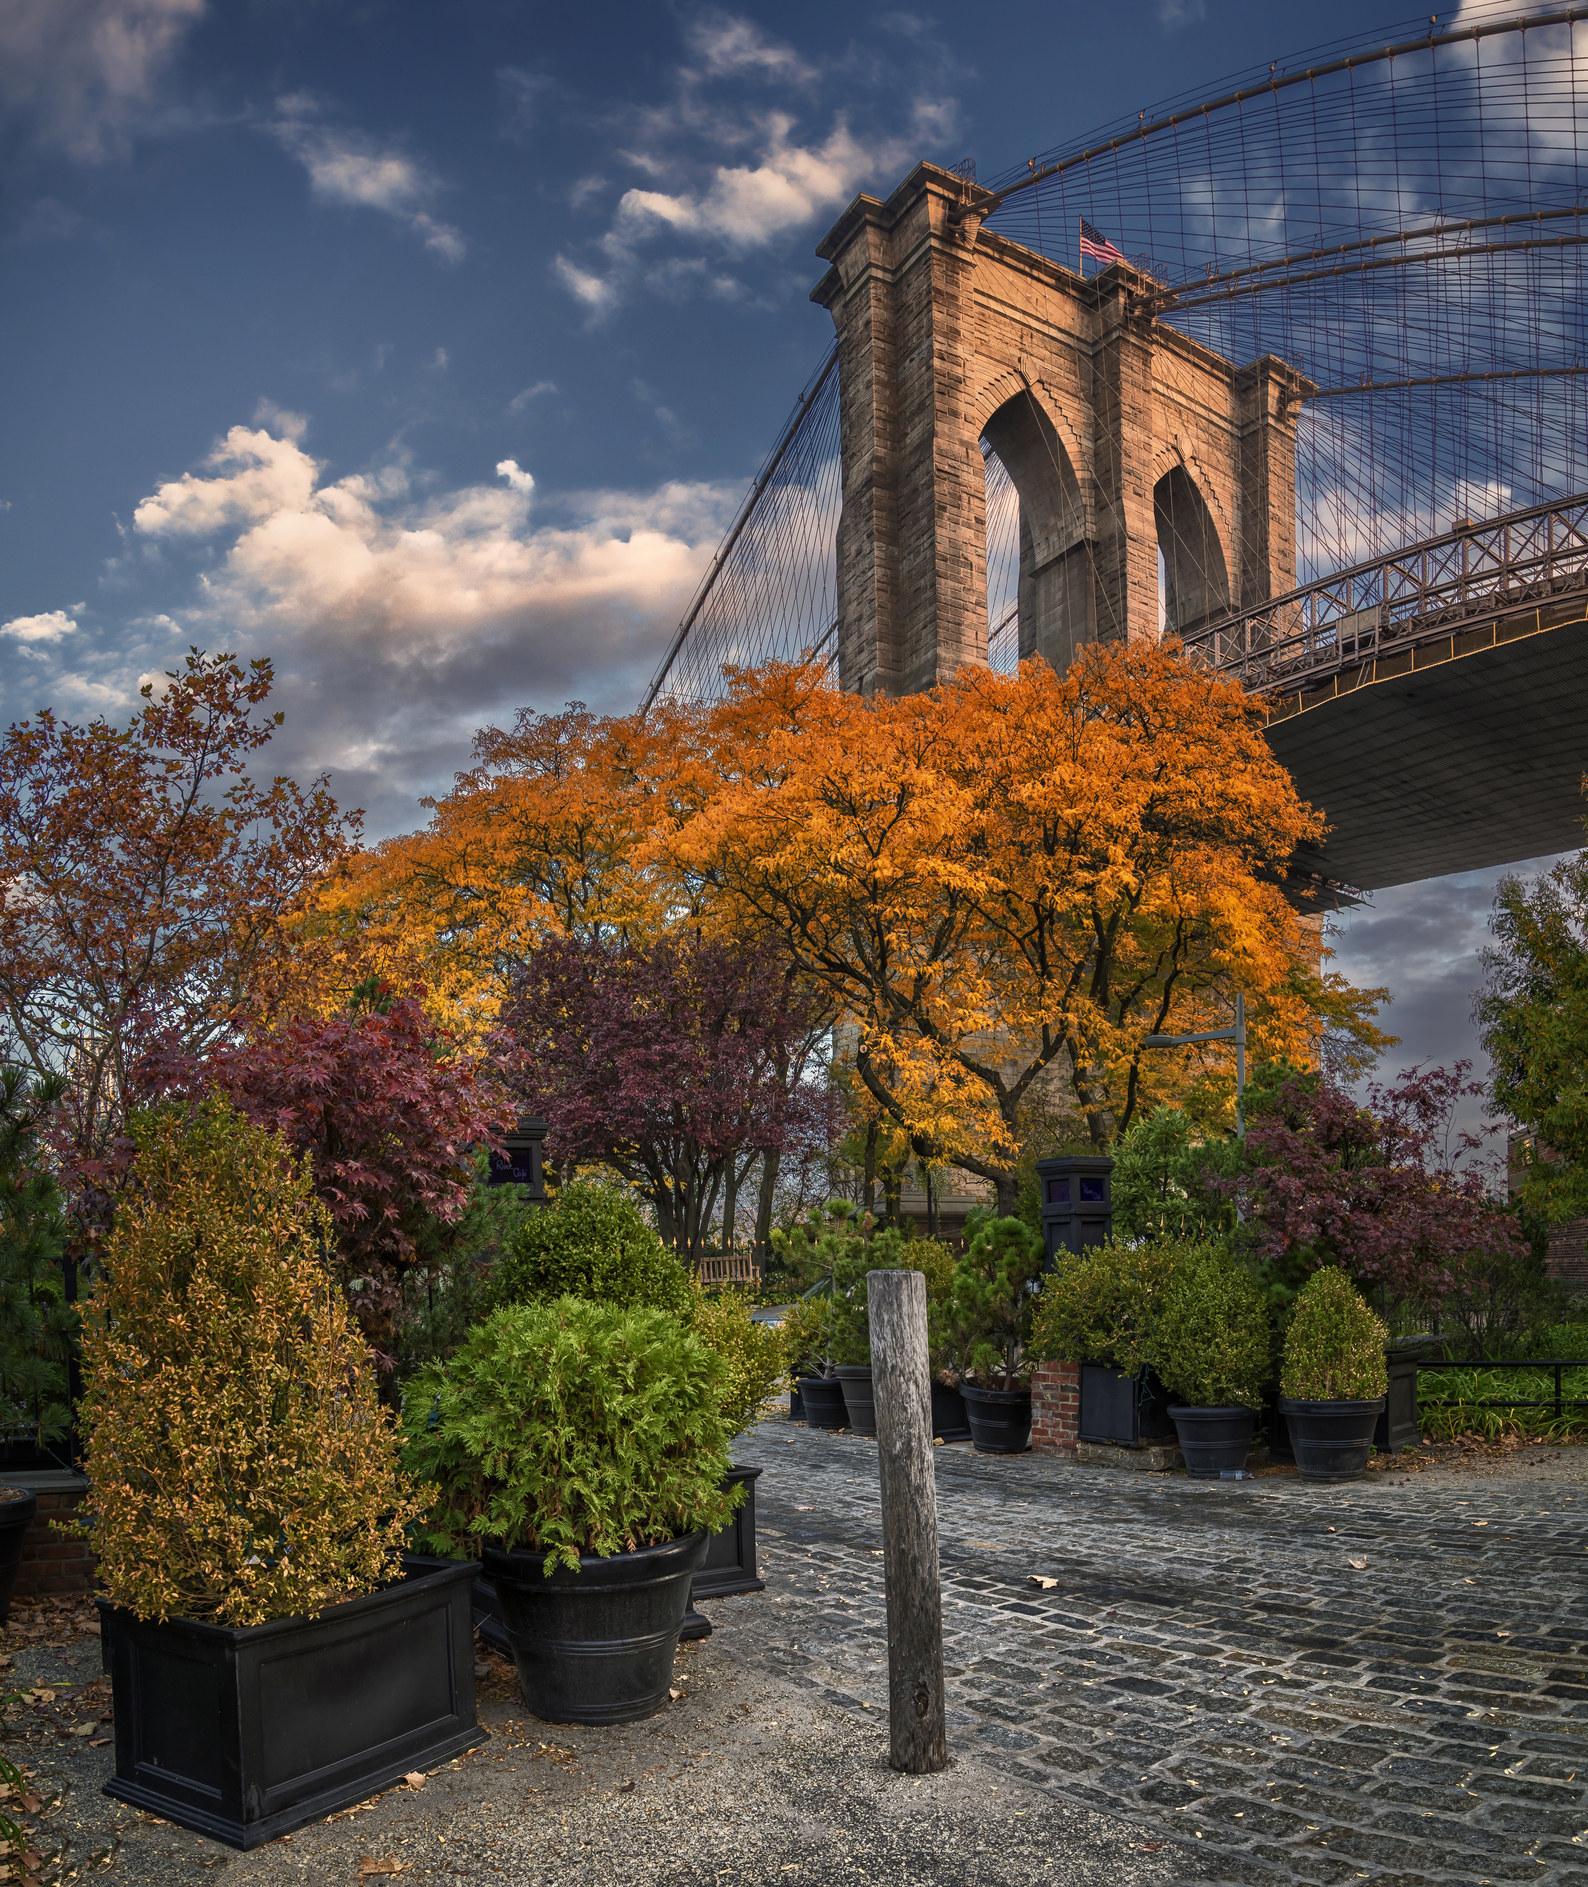 The Brooklyn Bridge with fall foliage